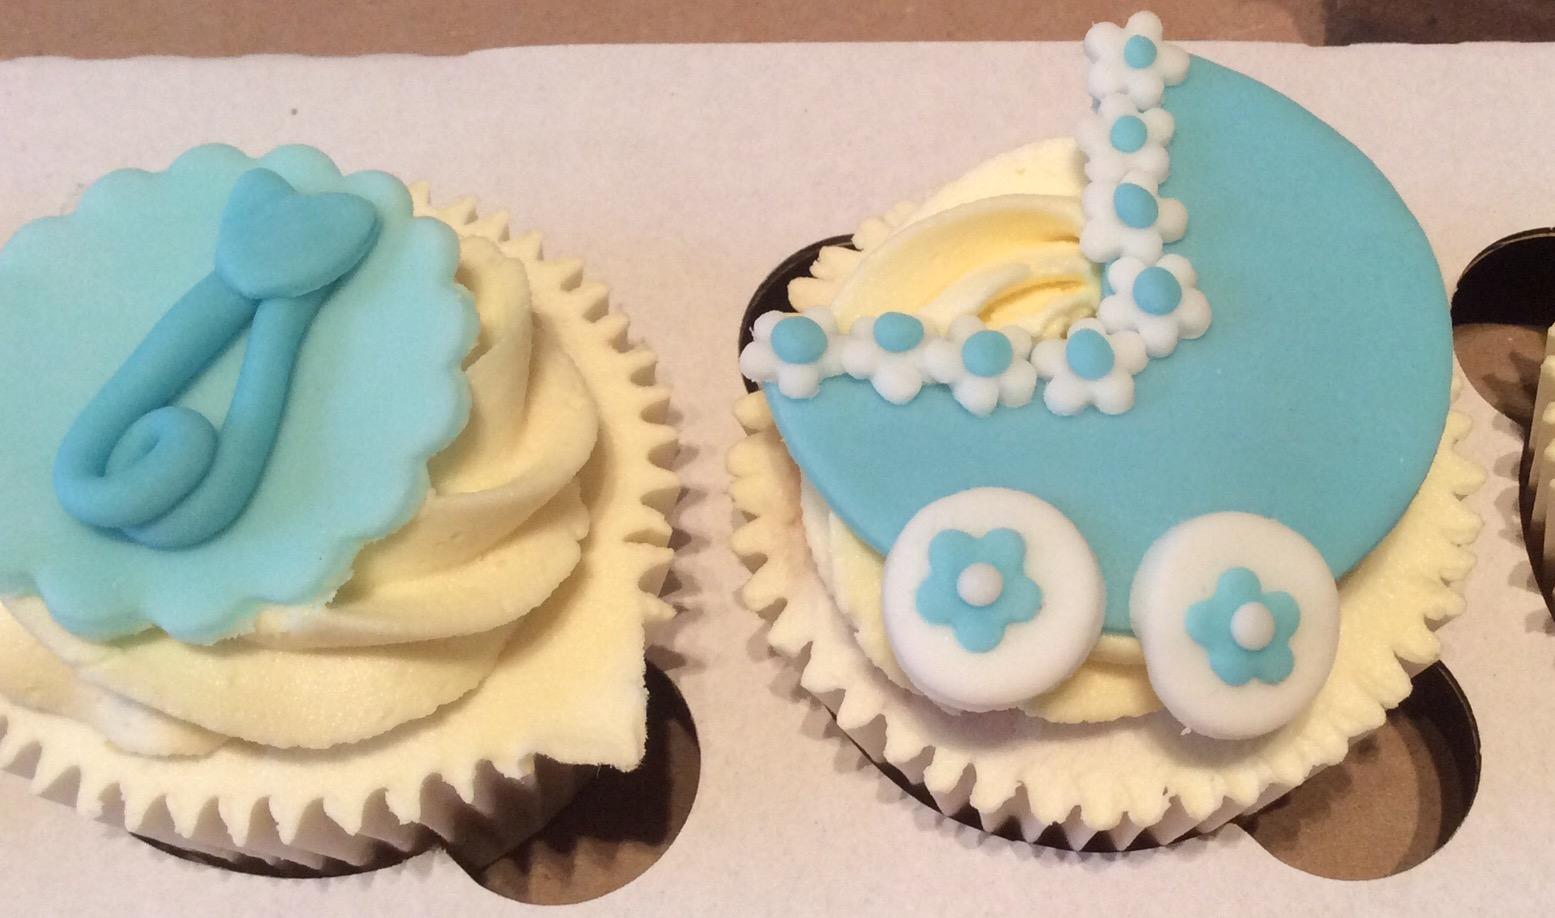 Baby Shower Cakes East Kilbride ~ Baby shower cupcakes u cakes by lizzie edinburgh